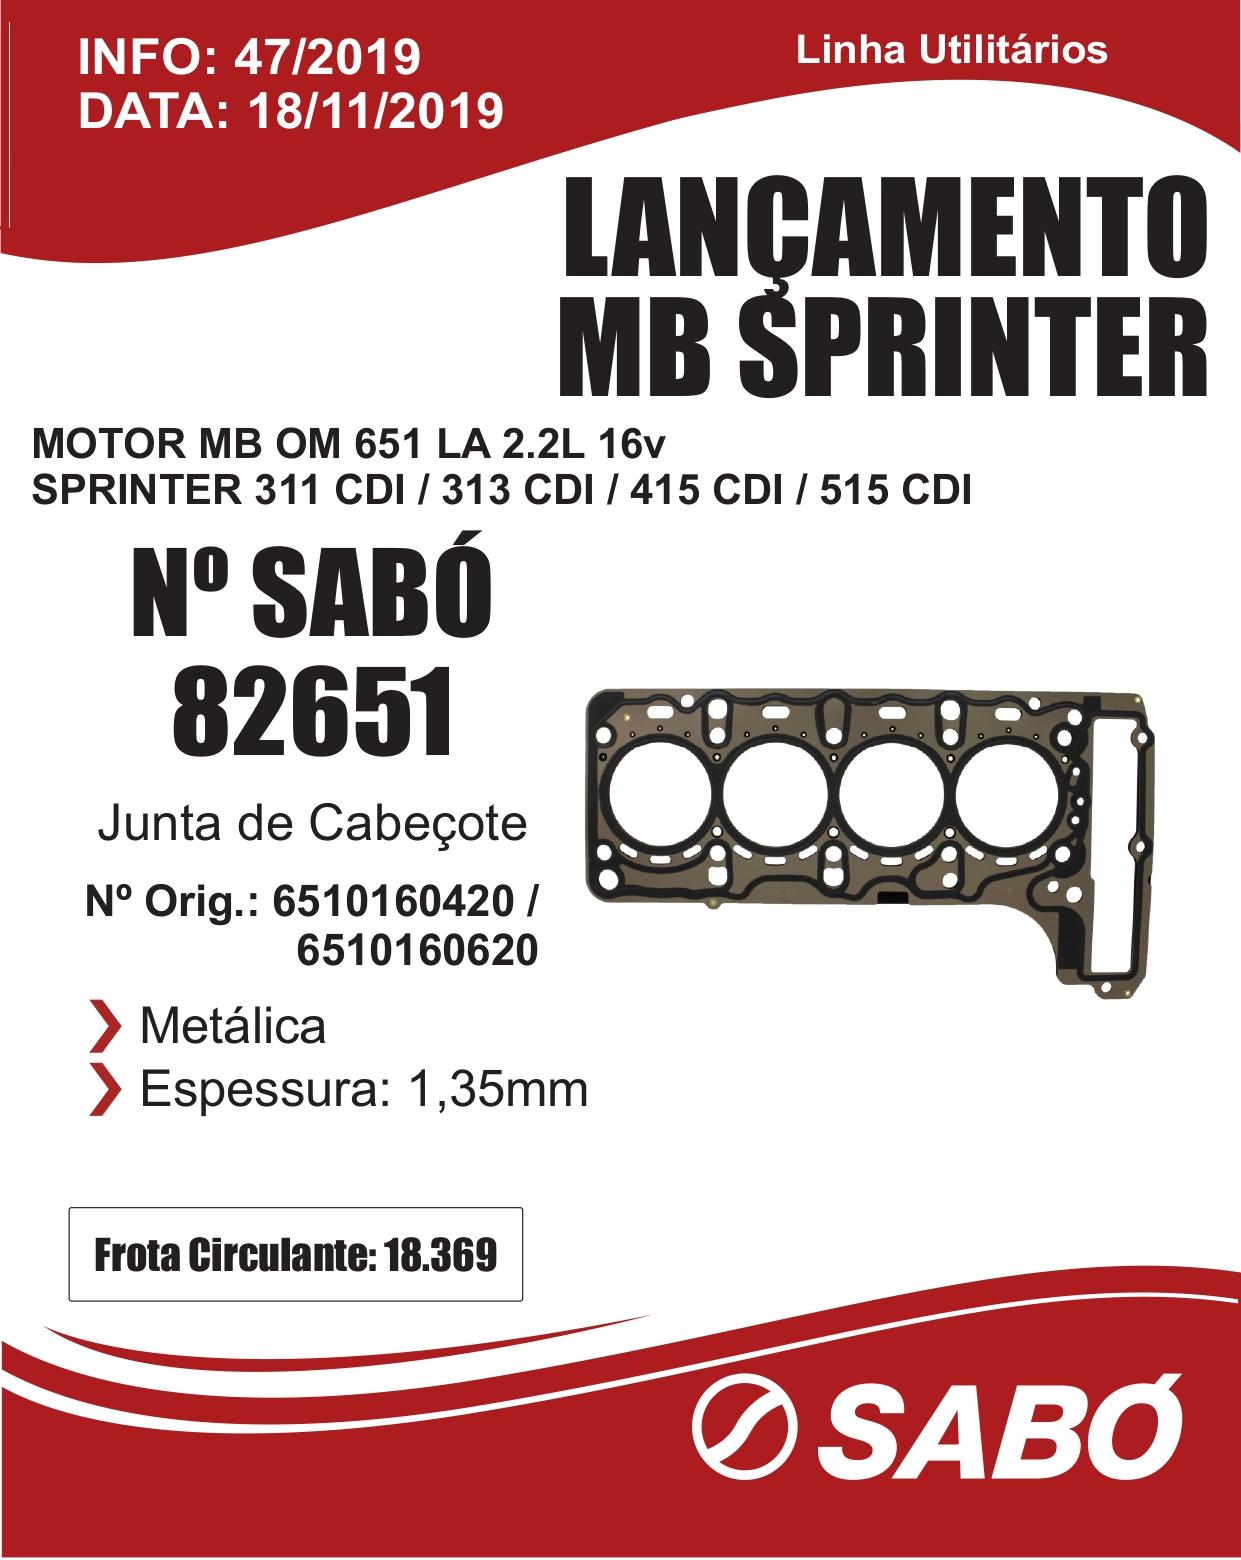 Info_047__Lancamento_MB_Sprinter_page-0001